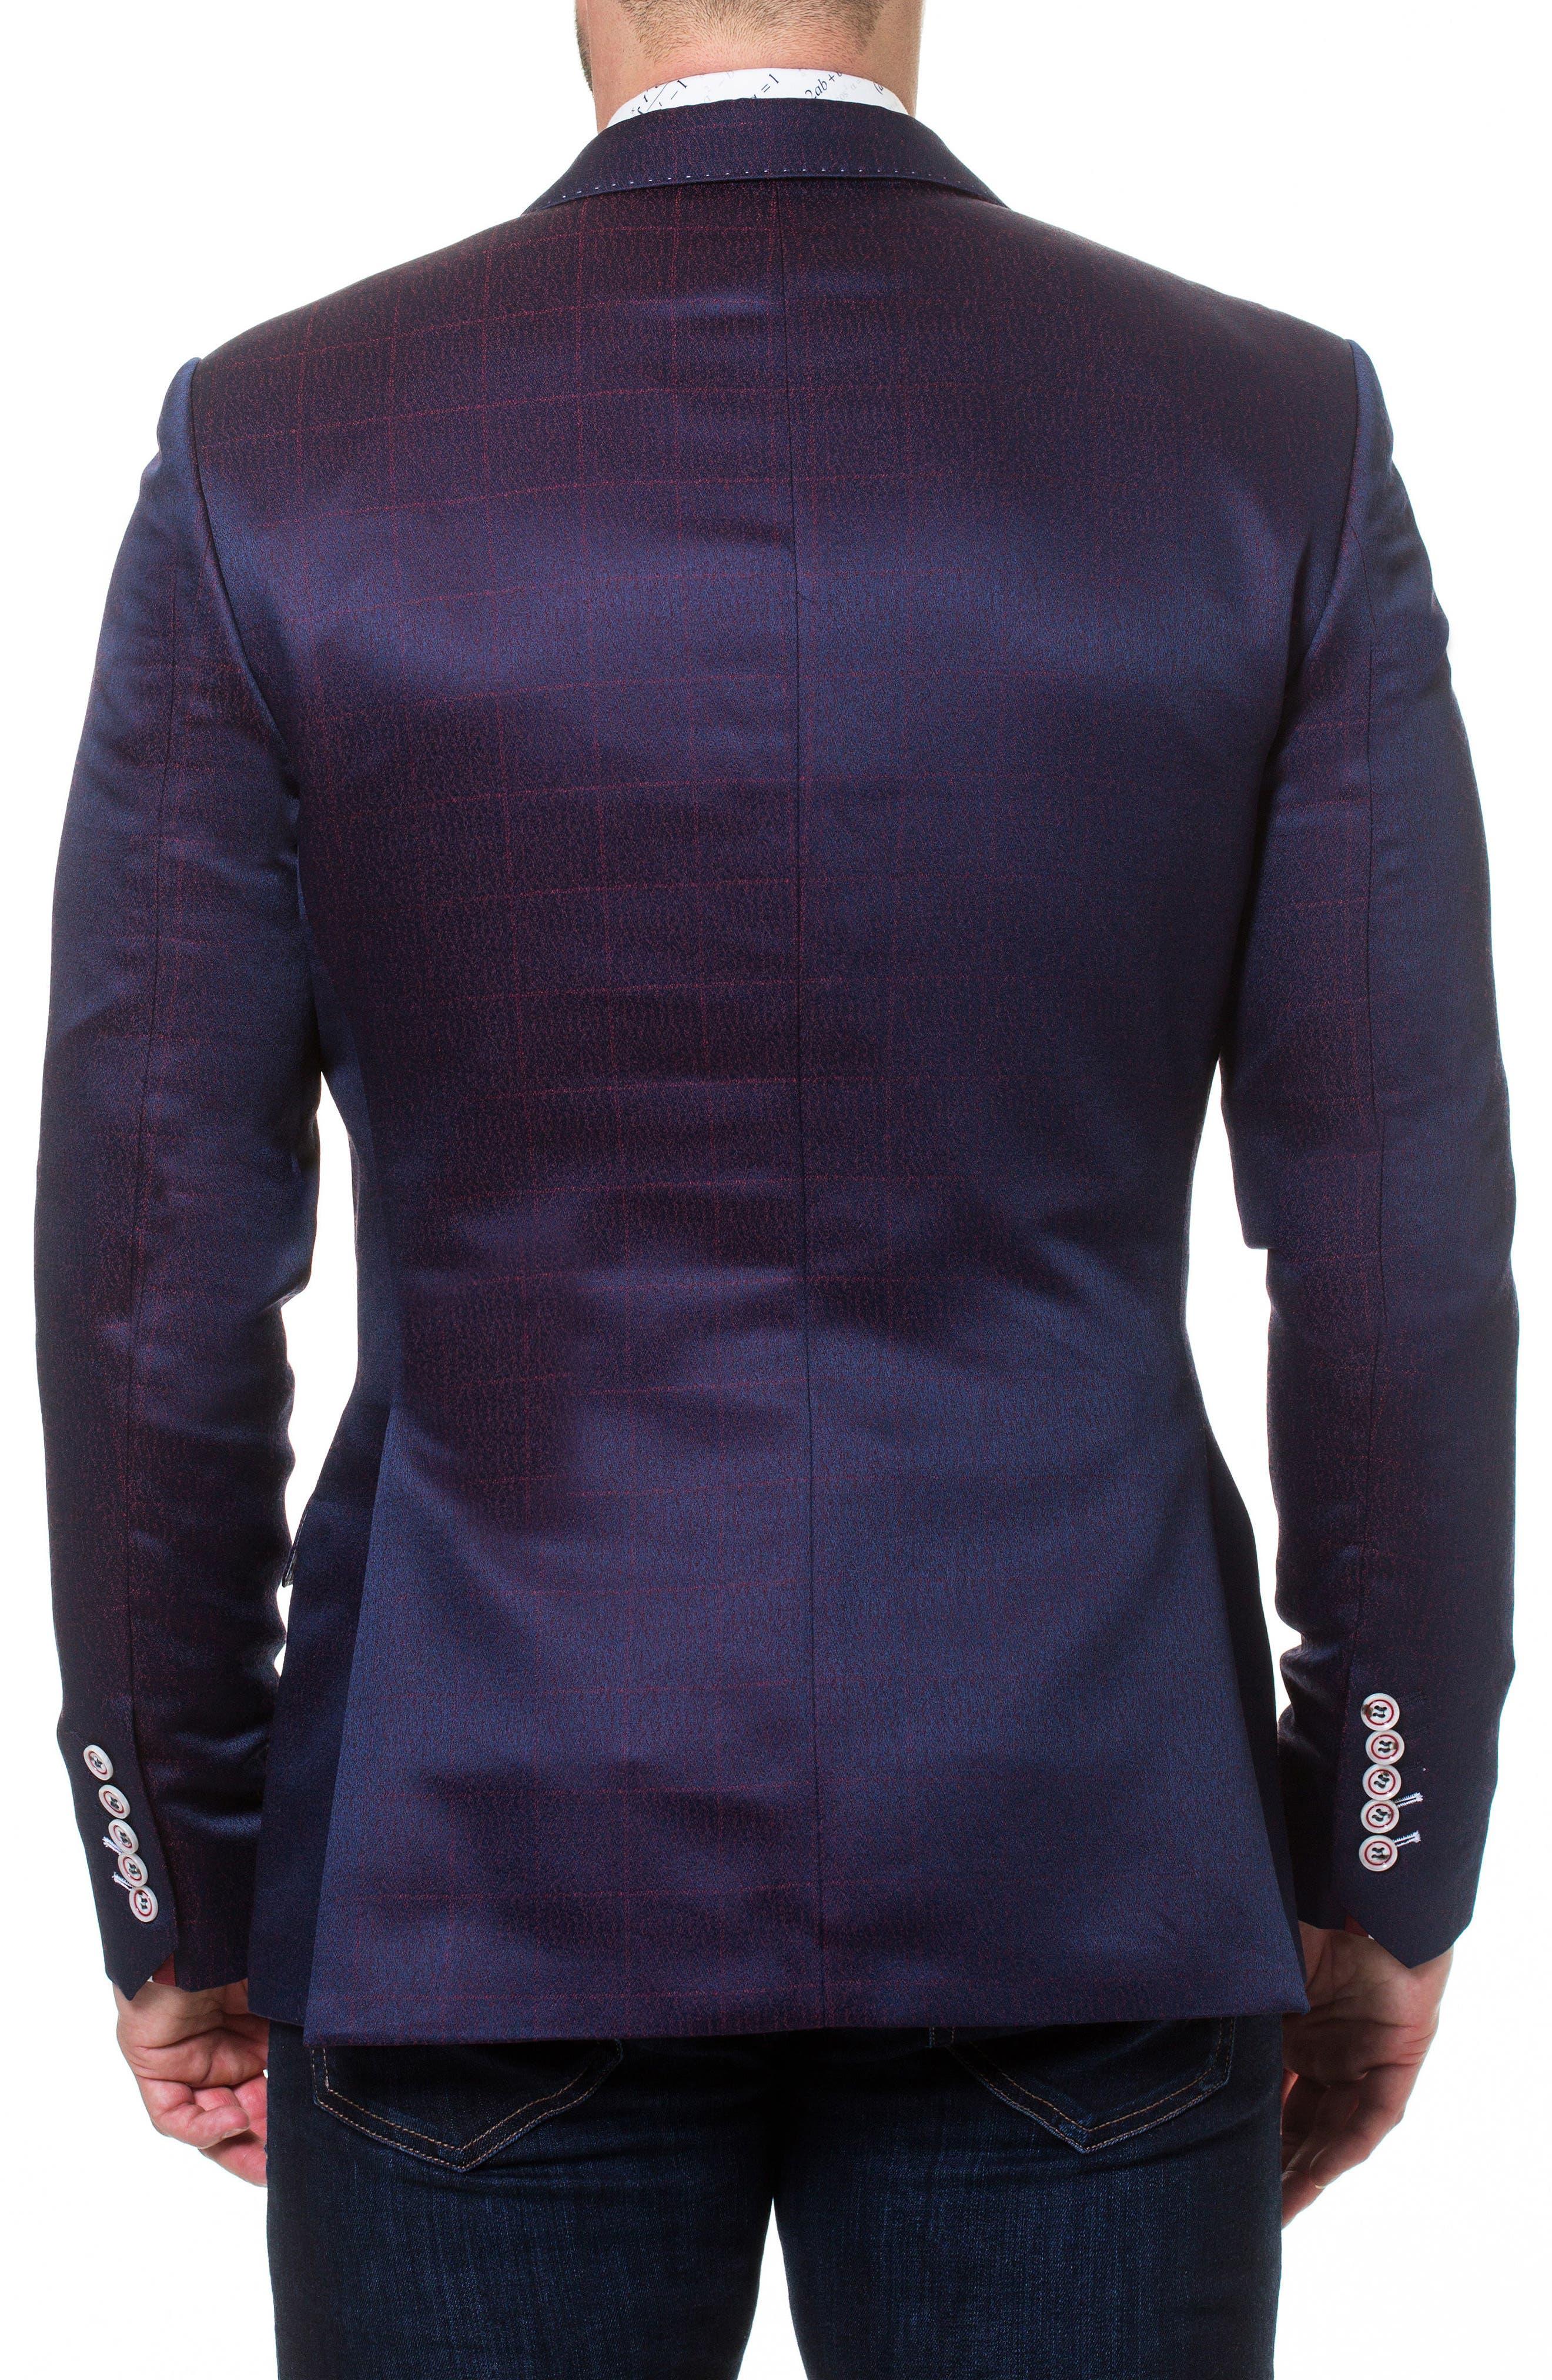 Socrate Fade Sport Coat,                             Alternate thumbnail 2, color,                             Purple